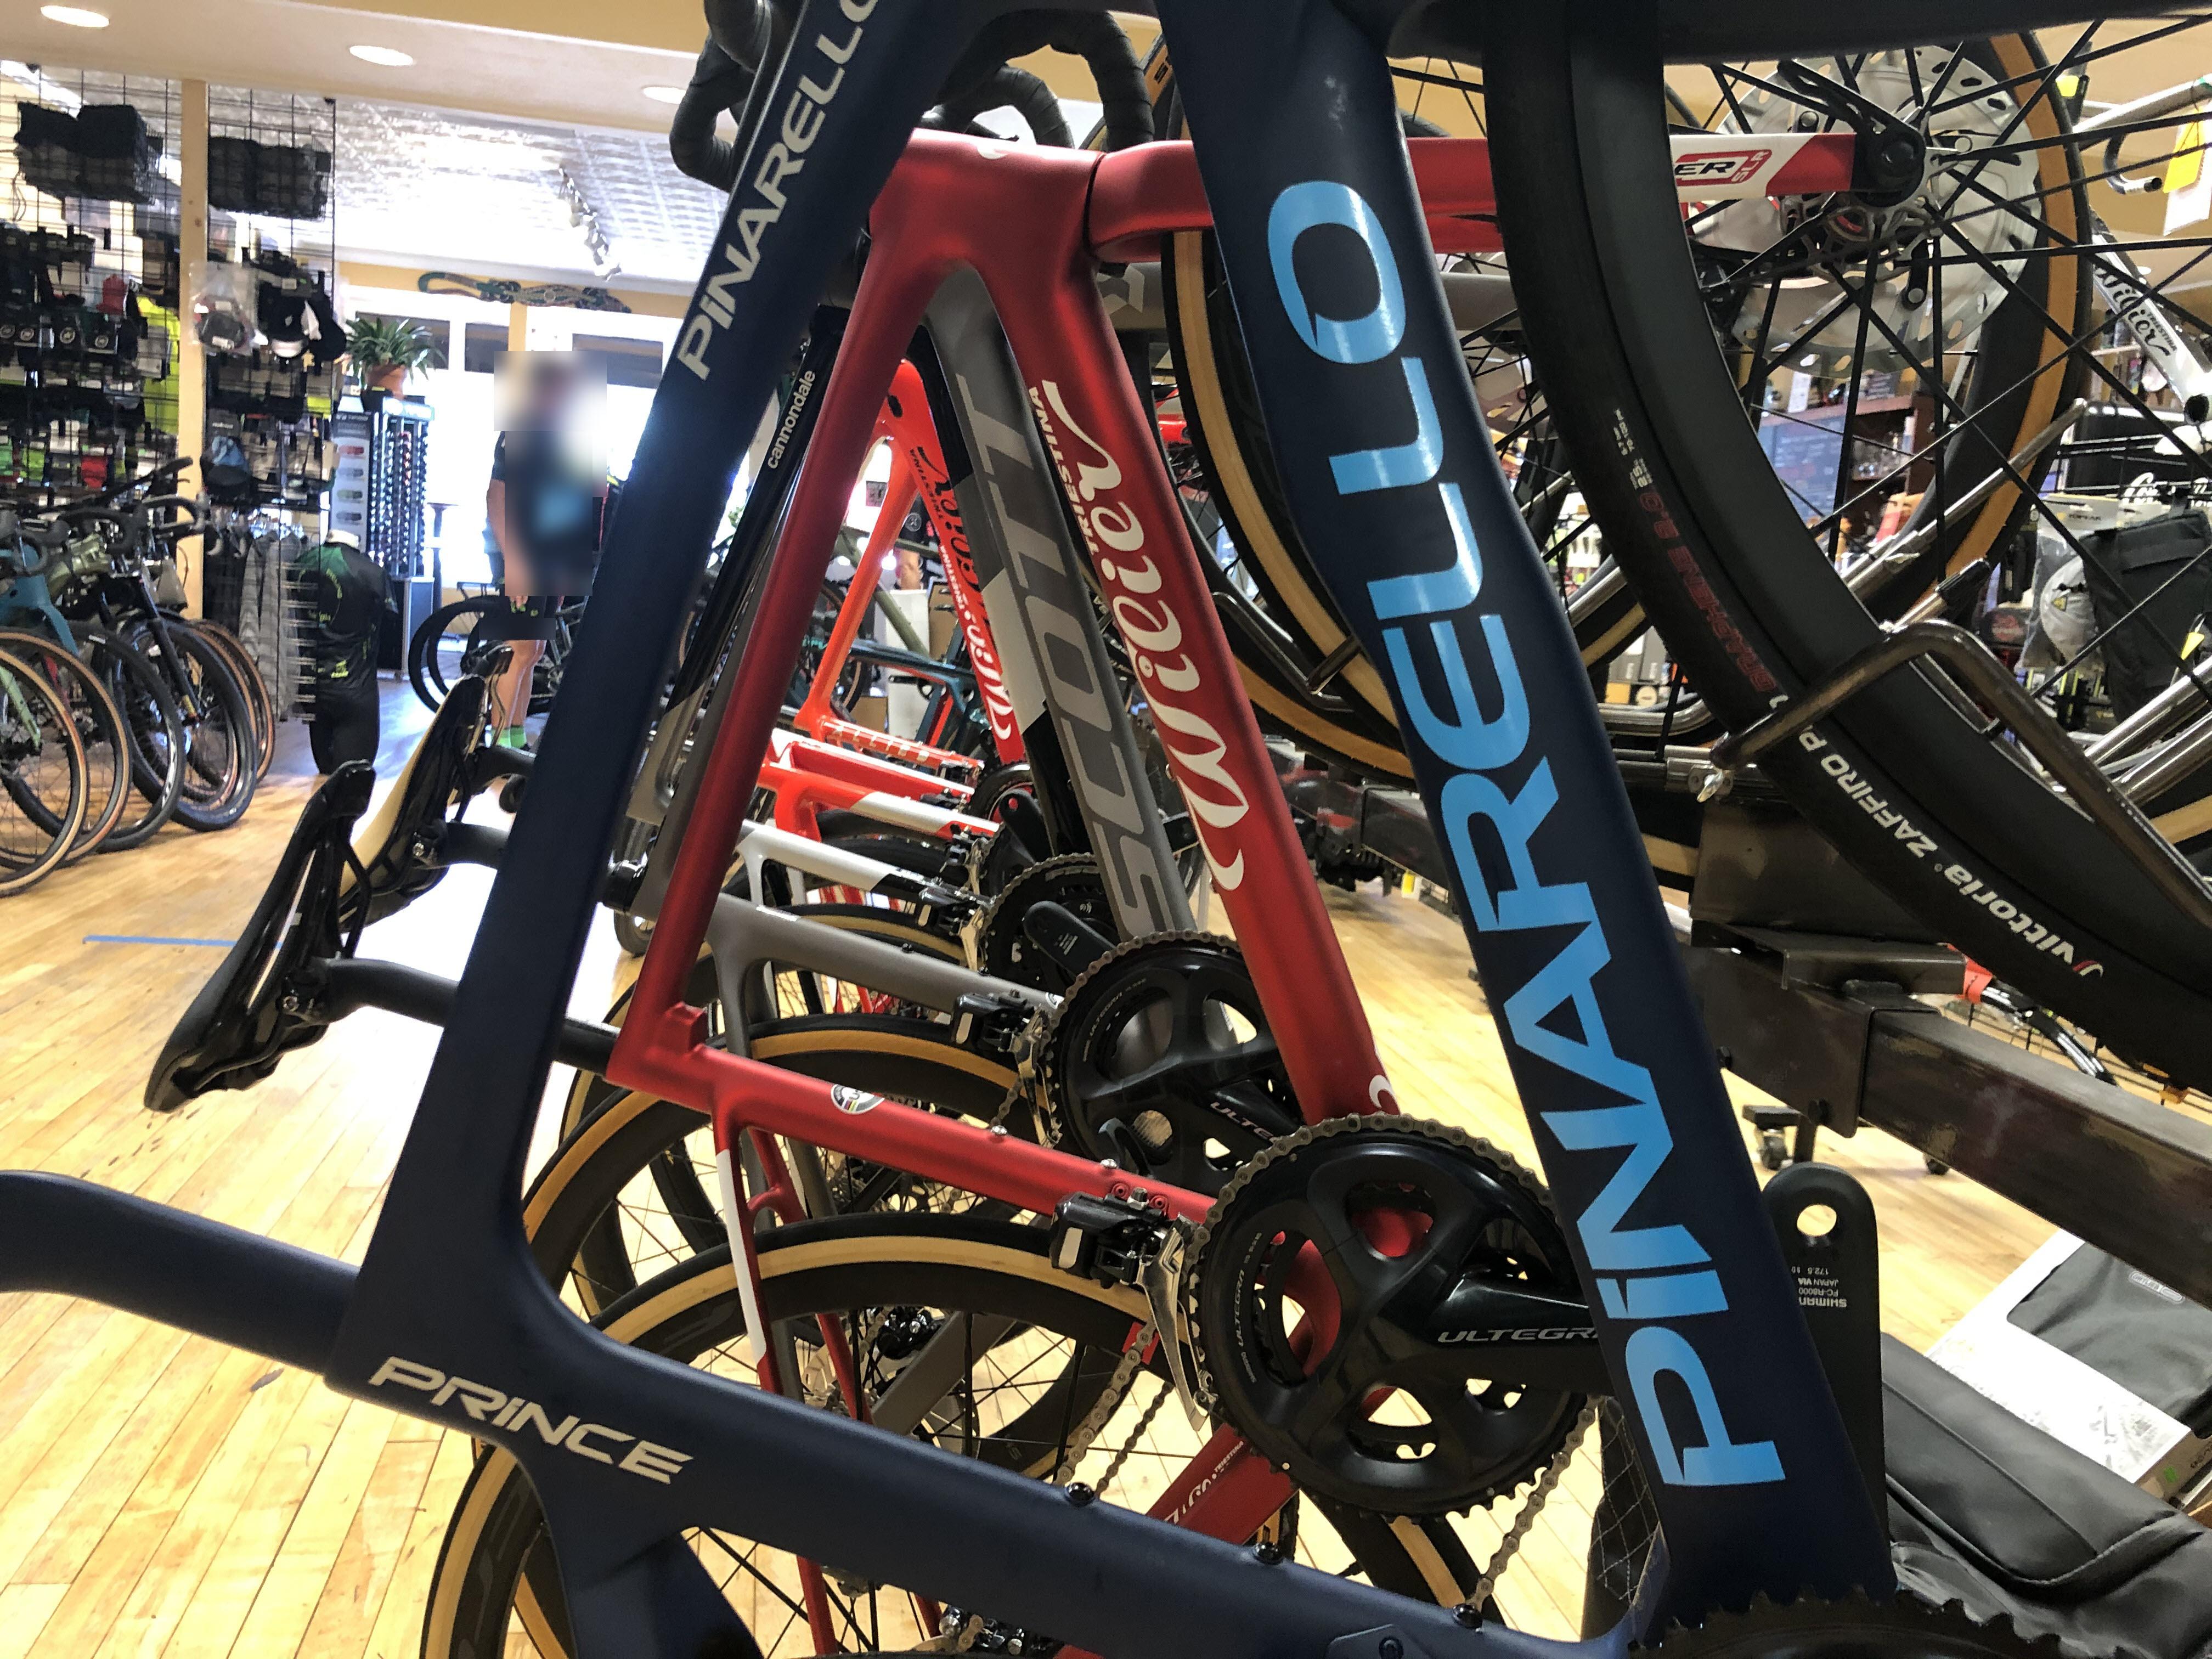 Bike brands on display